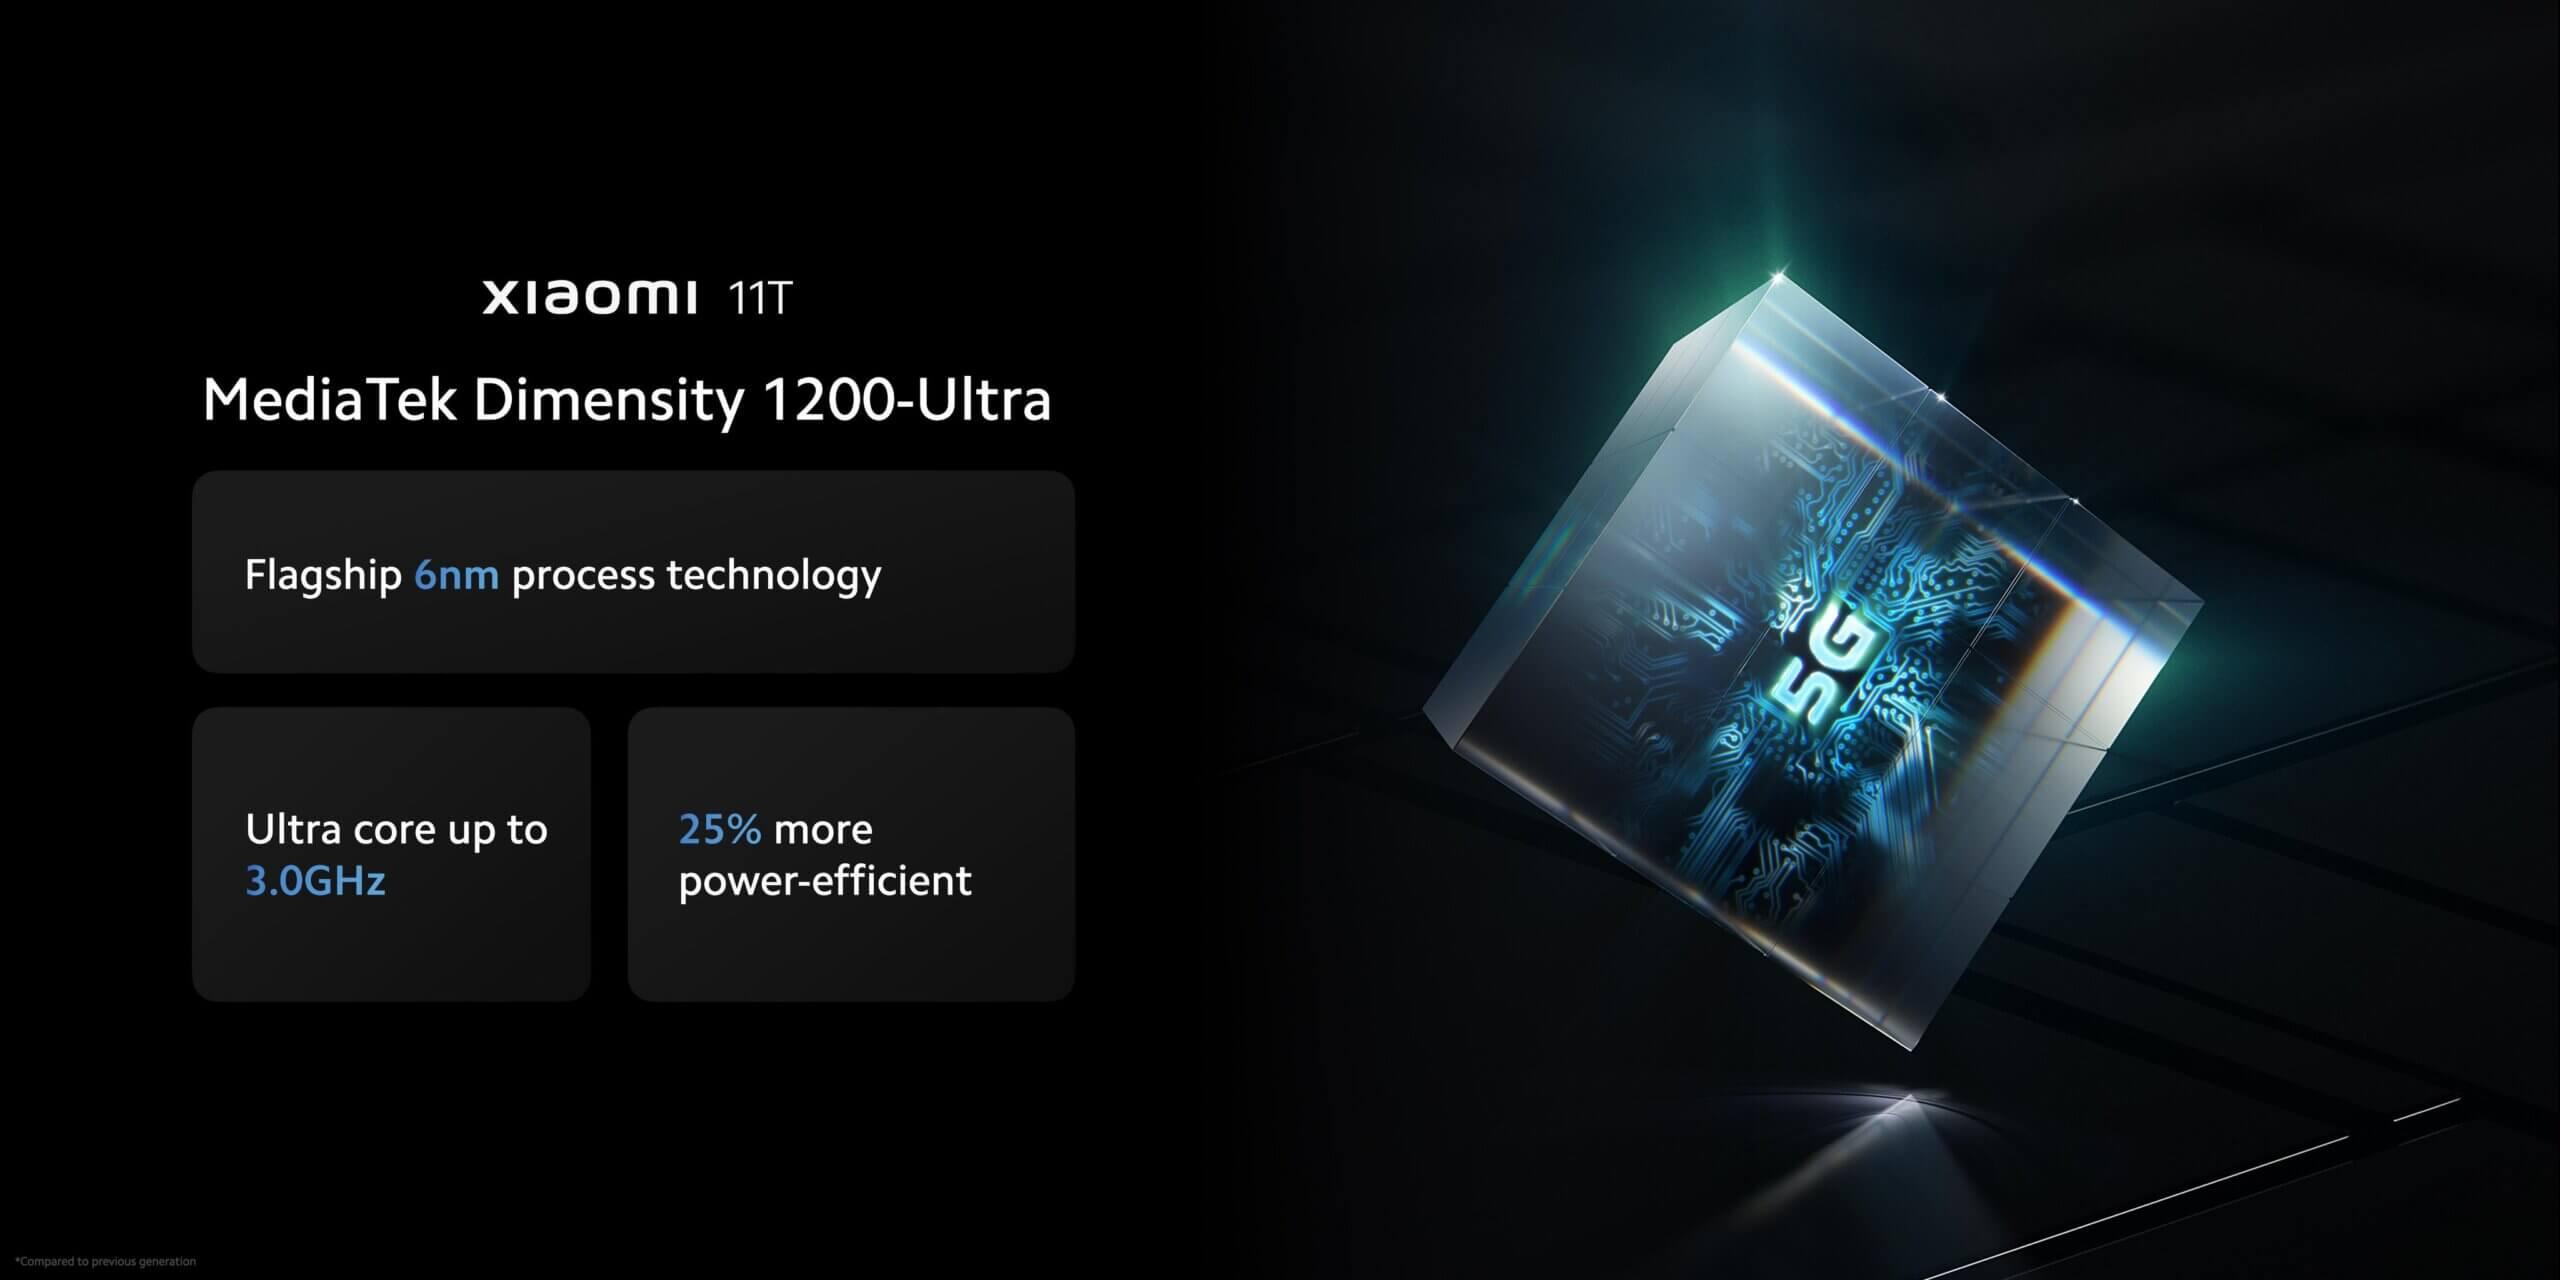 Dimensity 1200 Ultra